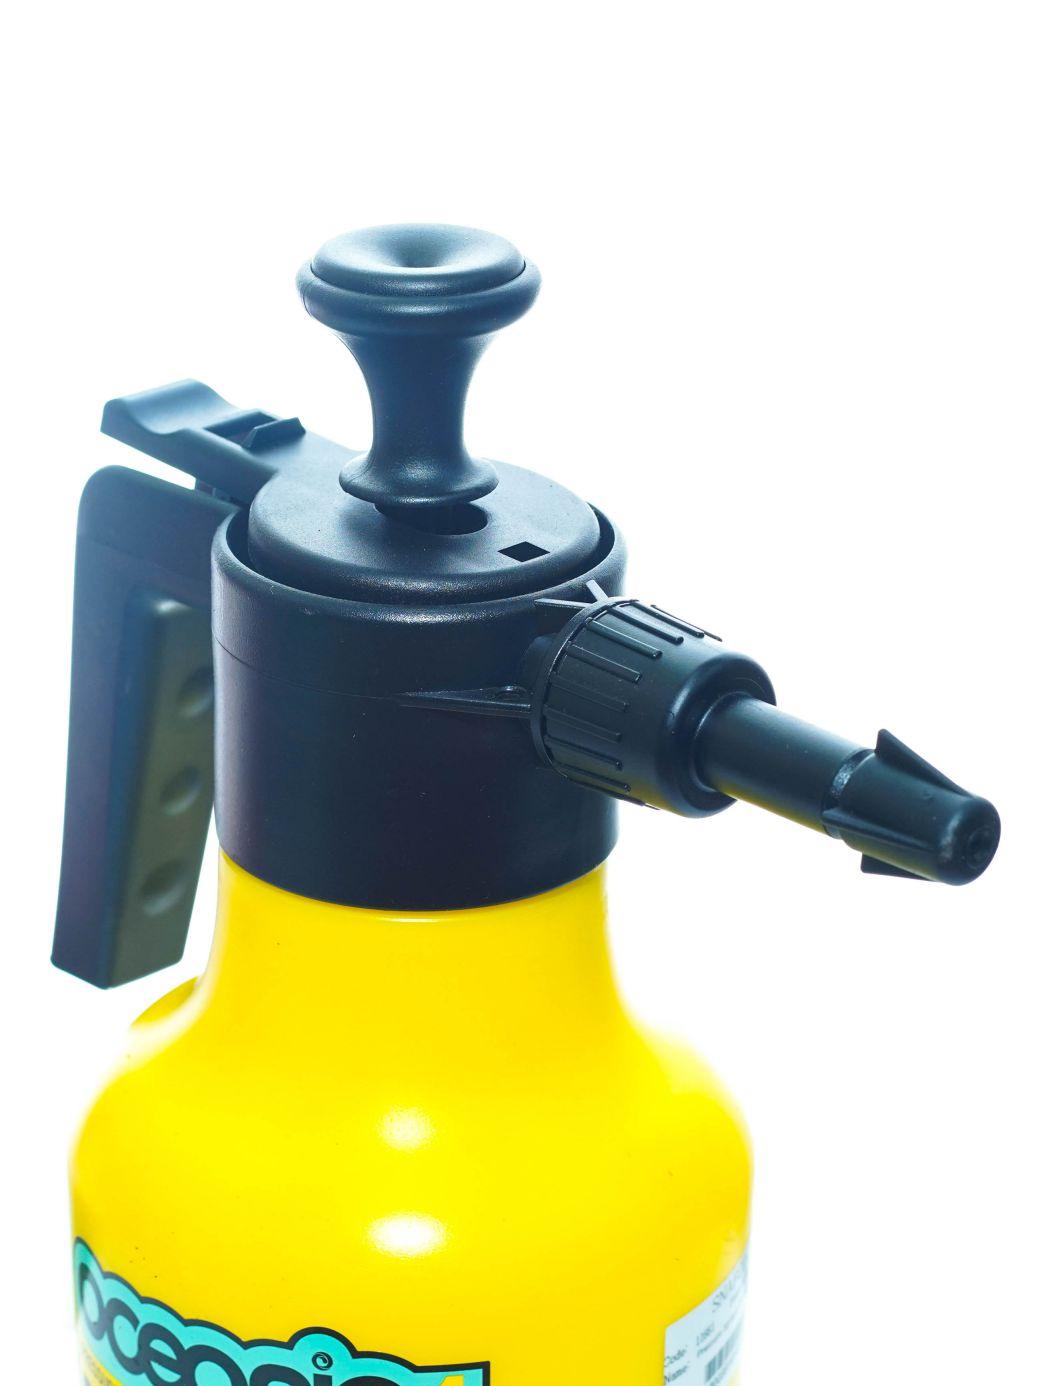 Pressure Sprayer Oceania Online